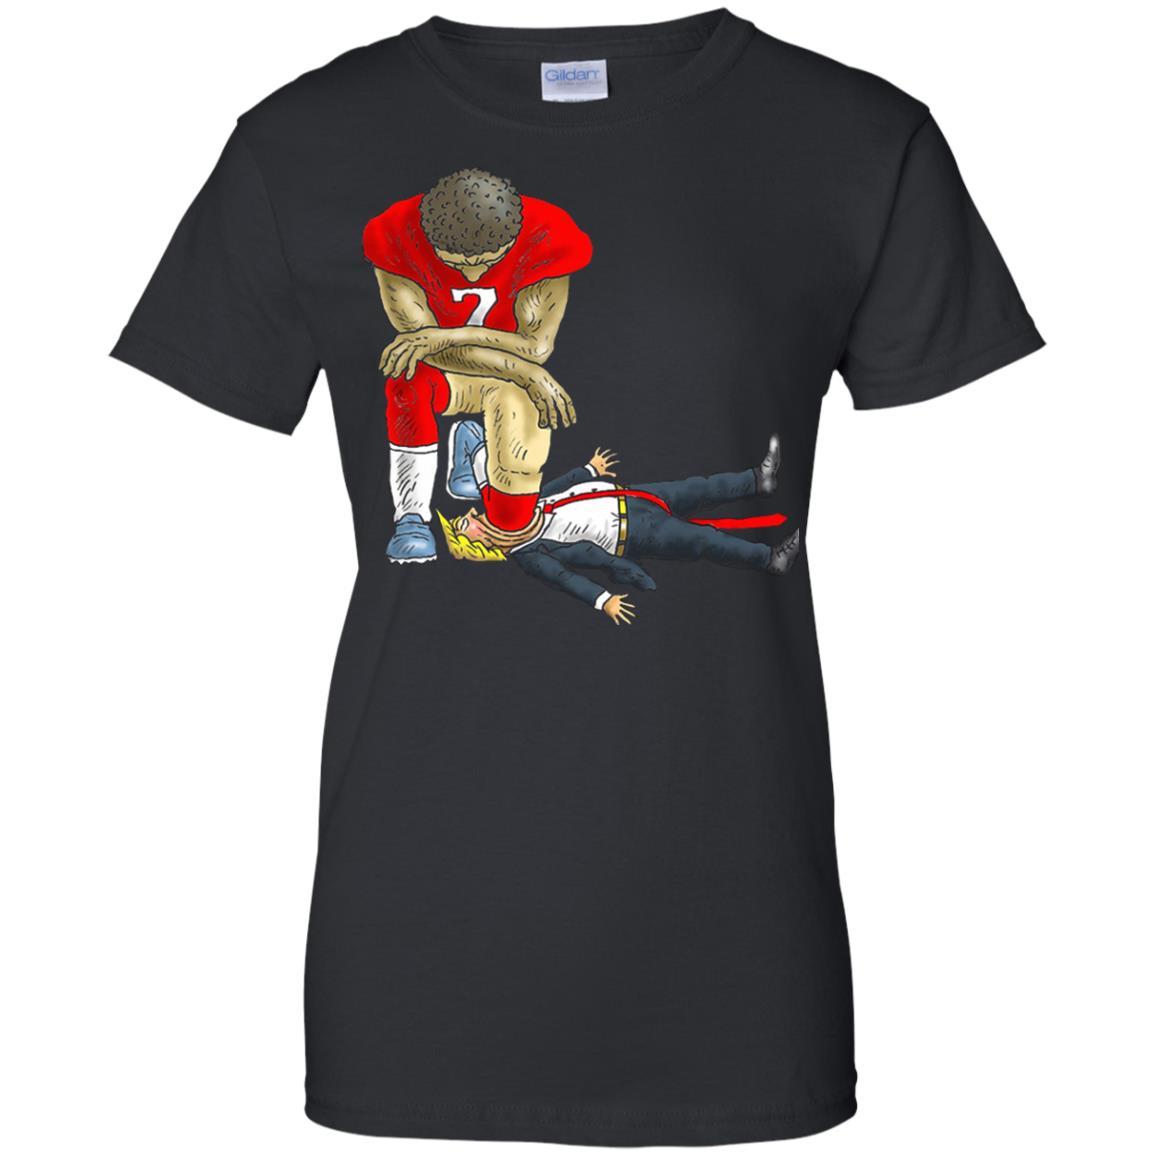 afec1d25 Colin Kaepernick kneels Donald Trump t-shirt, hoodie - Rockatee